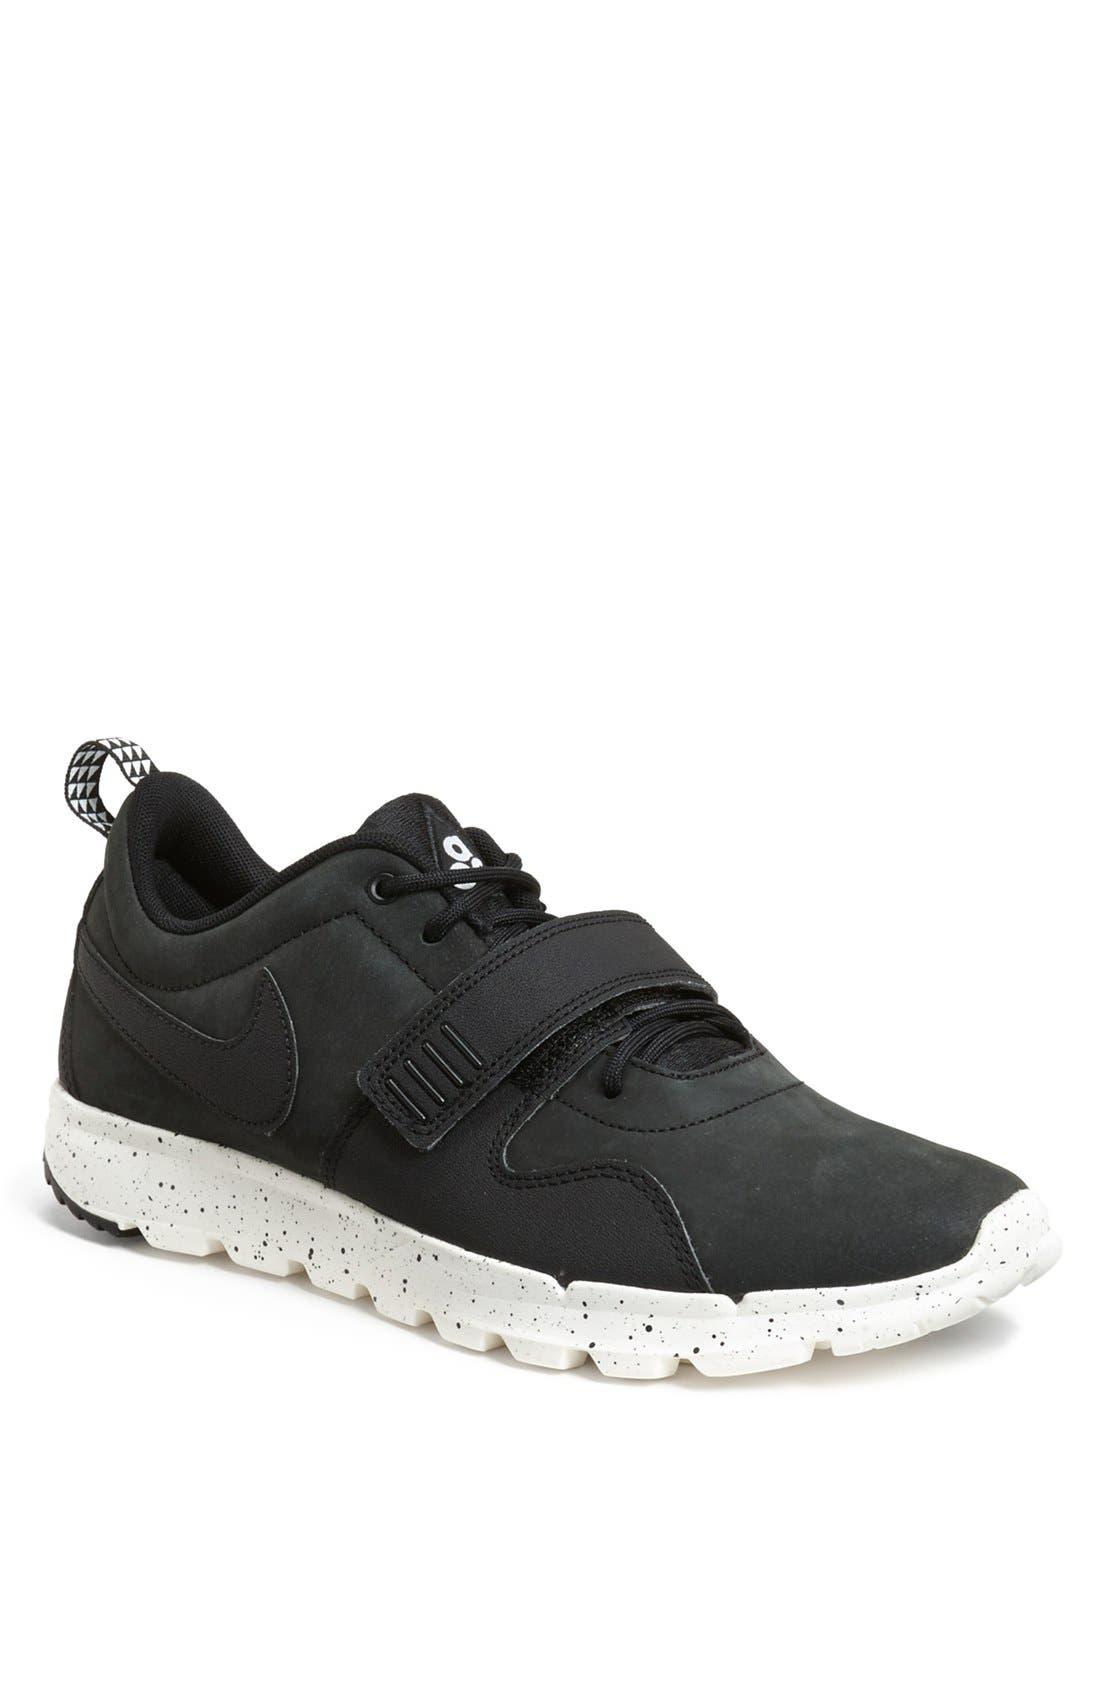 Main Image - Nike 'Trainerendor' Training Shoe (Men)